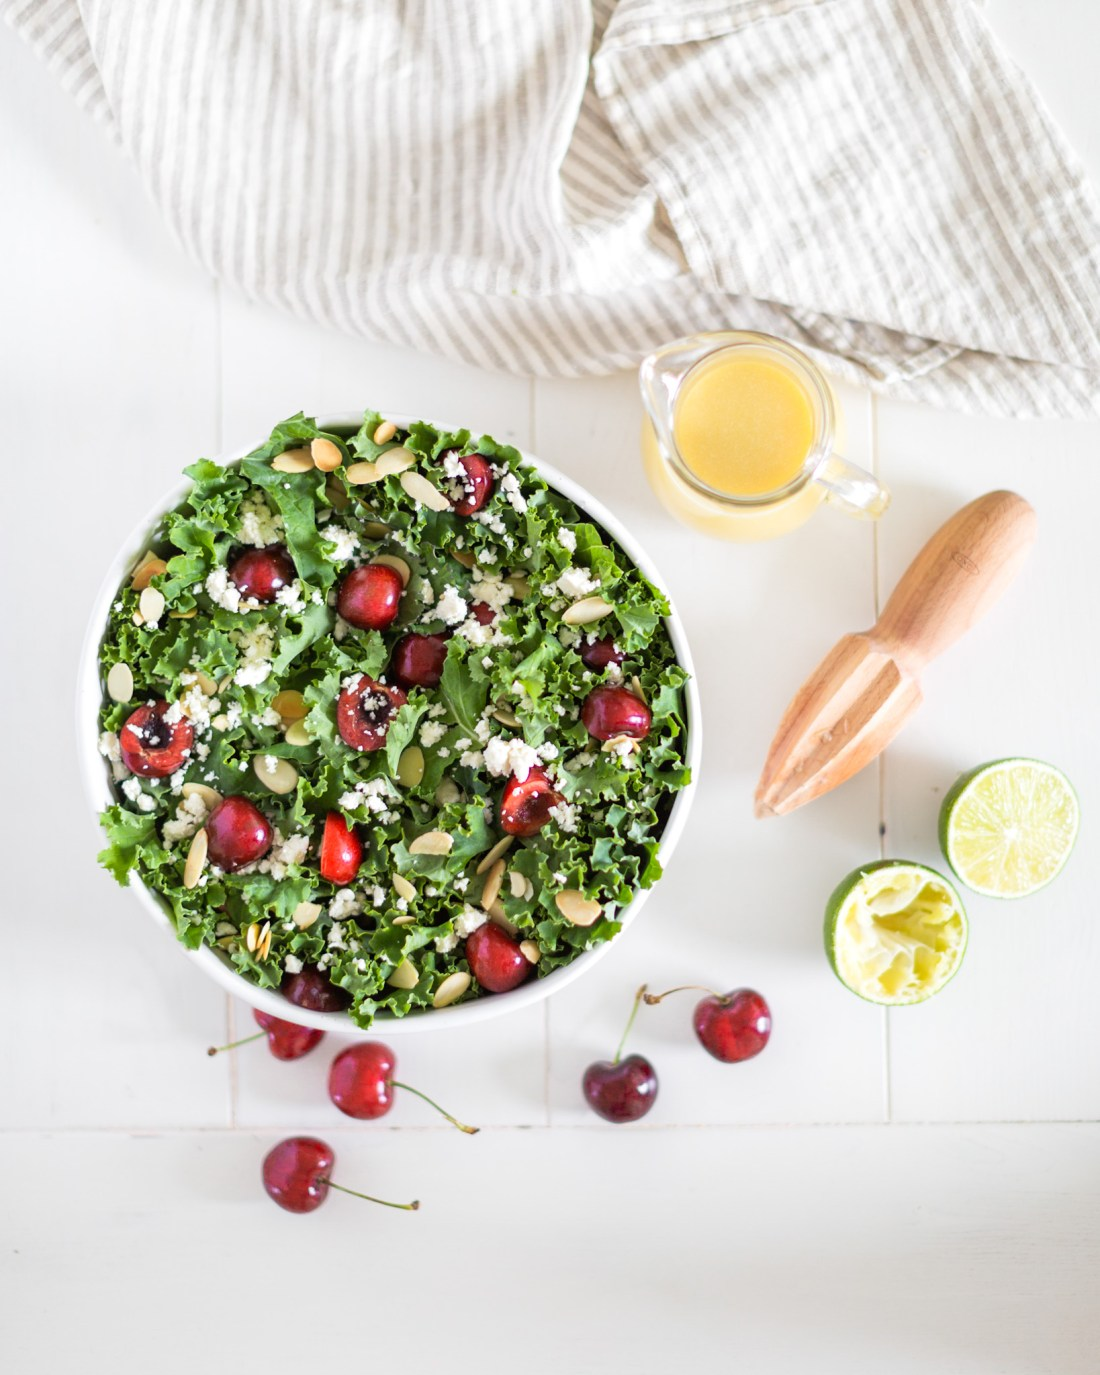 Summer Cherry Kale Salad Recipe with Honey Lime Vinaigrette (Gluten Free & Vegan)